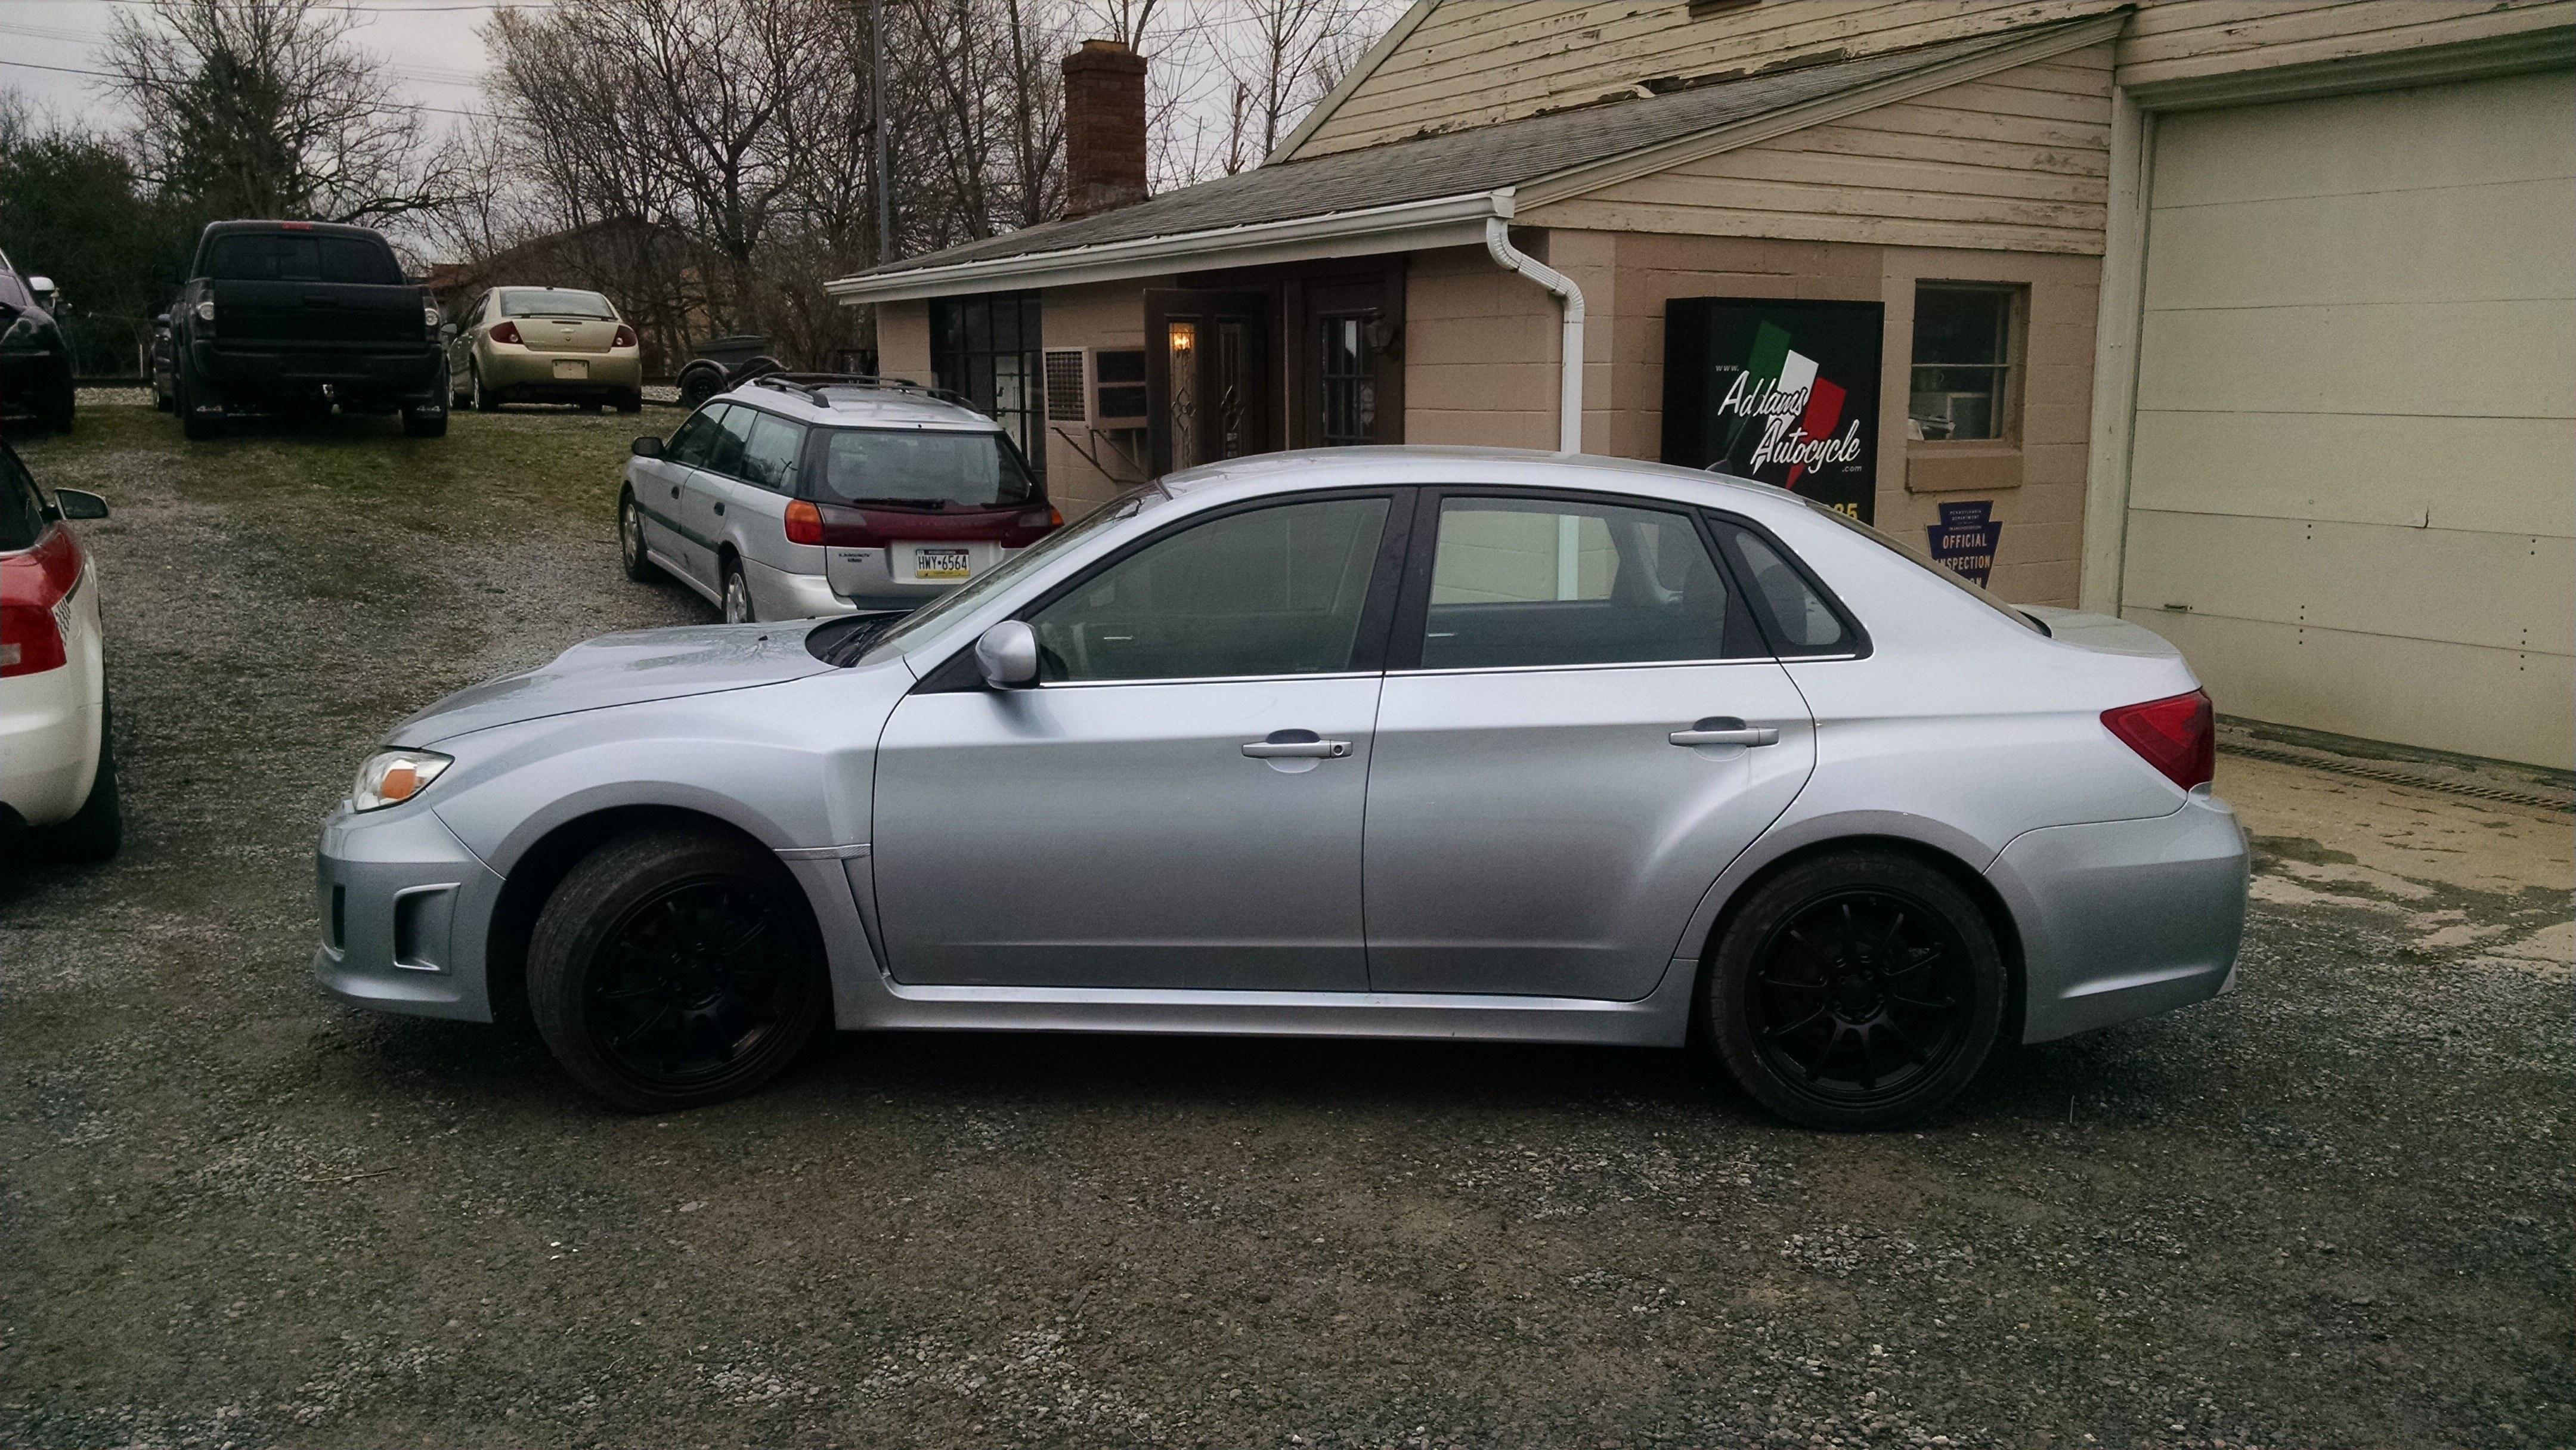 2012 subaru wrx impreza automobile harmony pennsylvania n/a